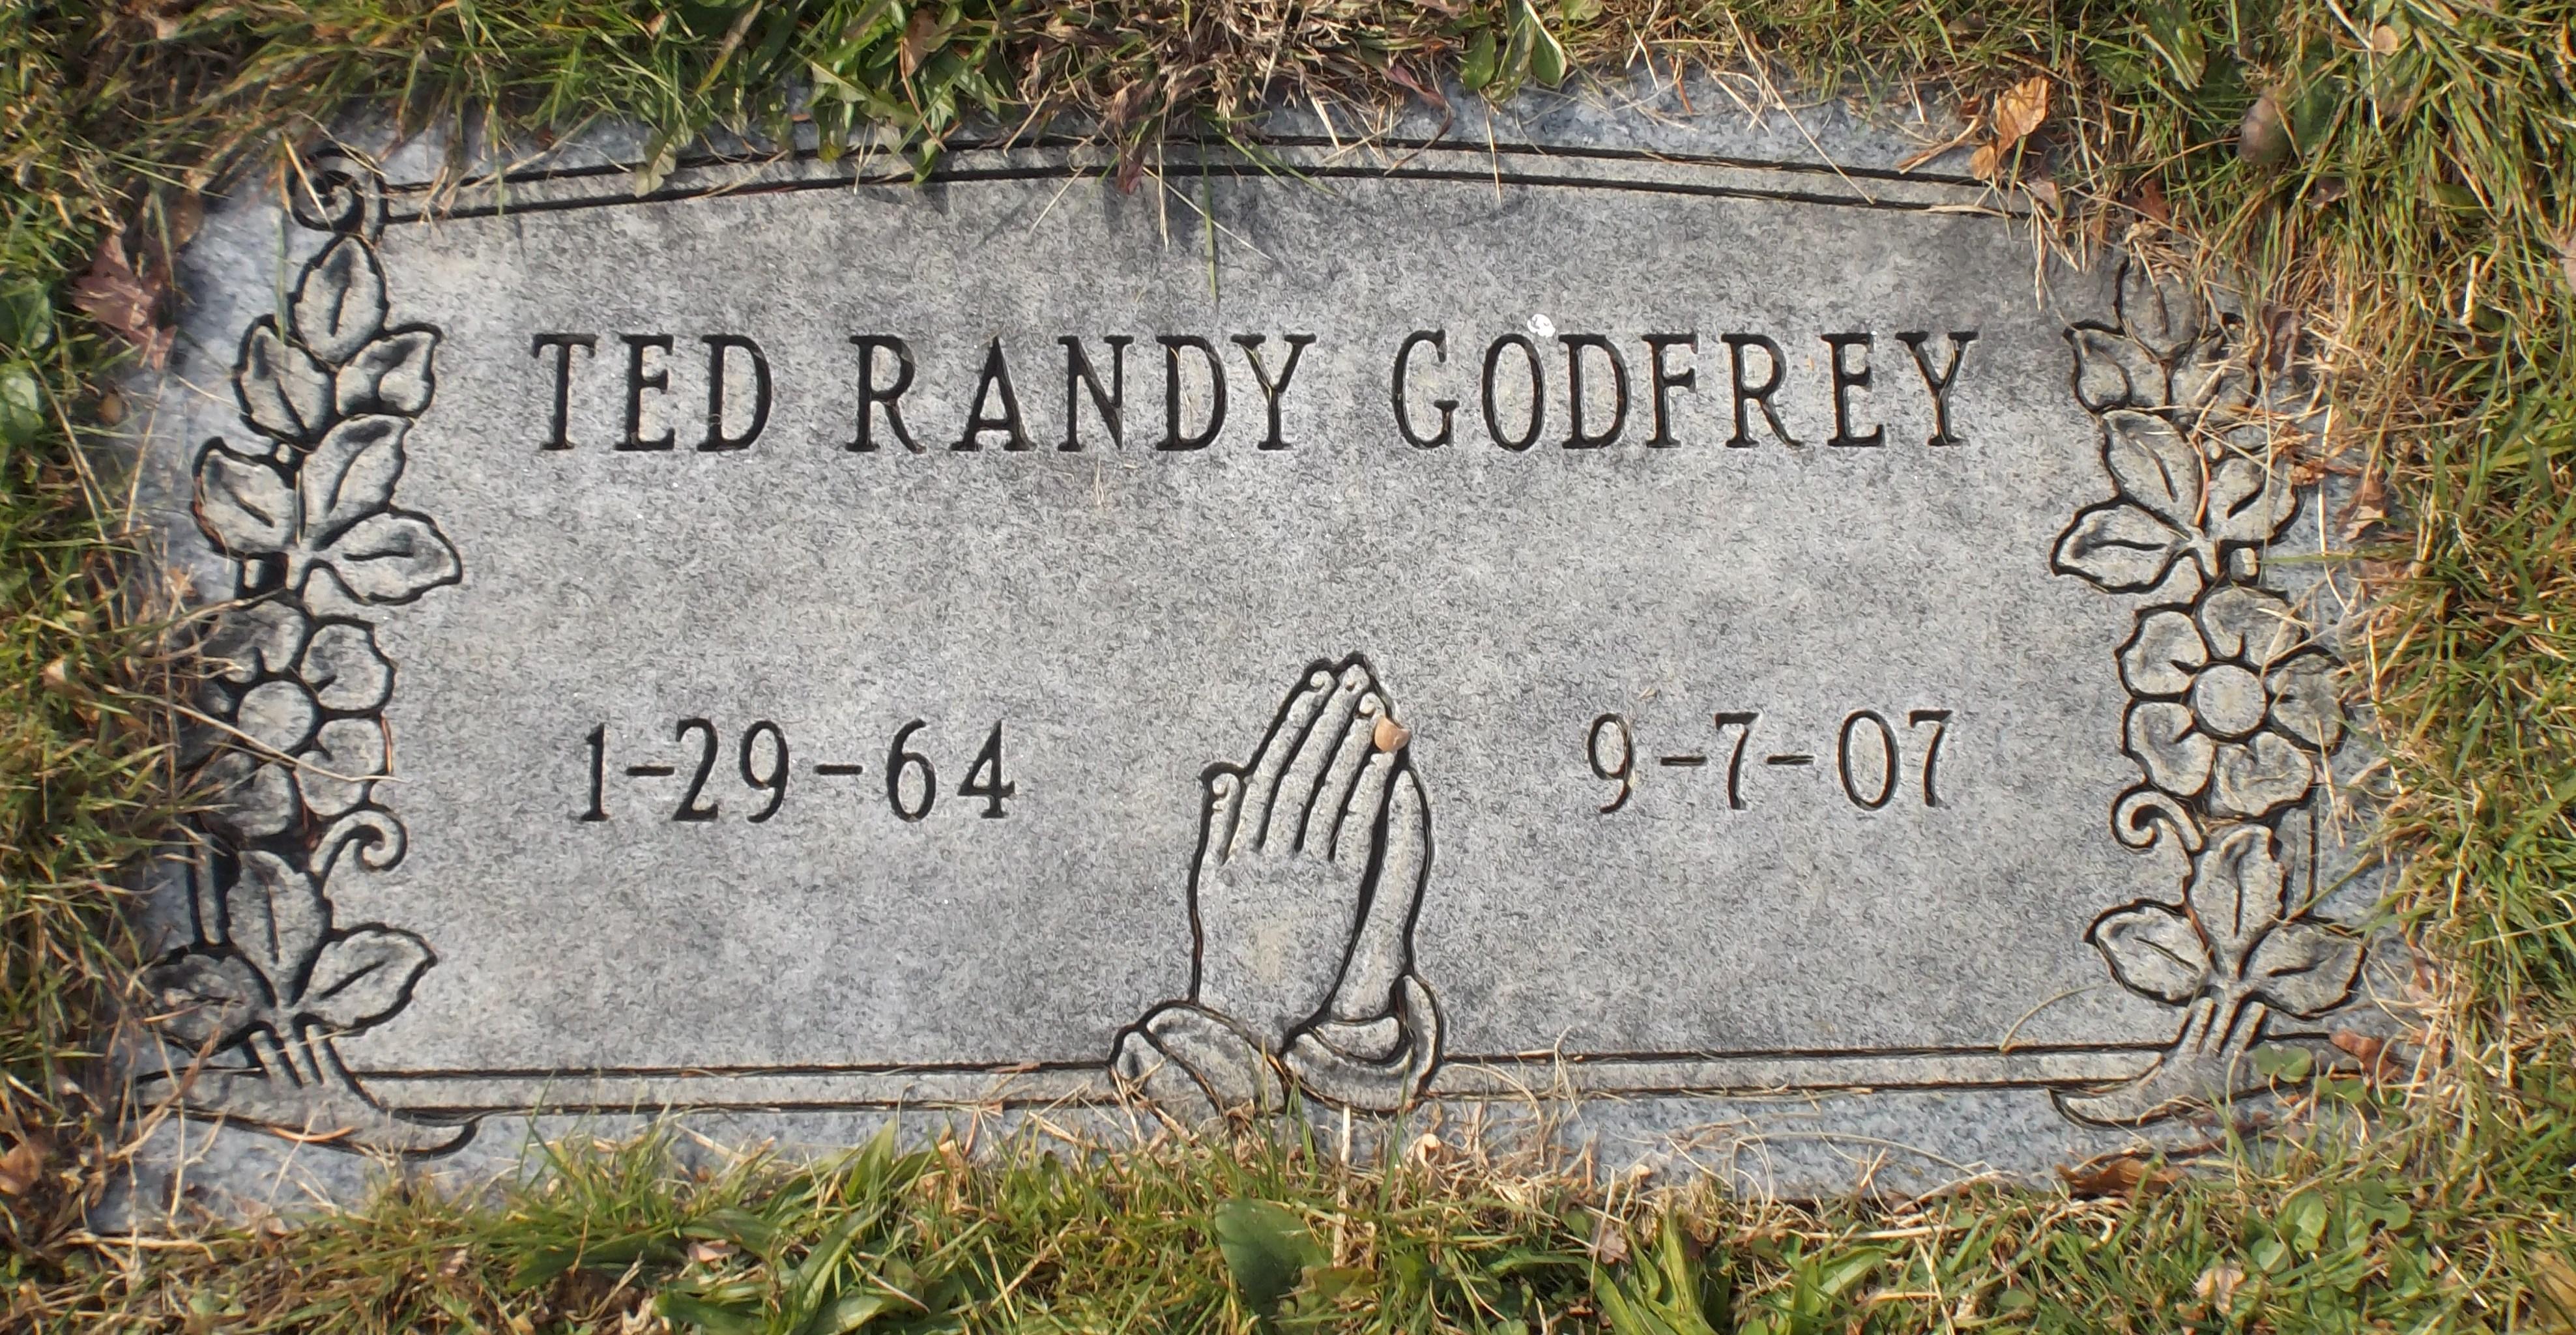 Ted Randolph Randy Godfrey